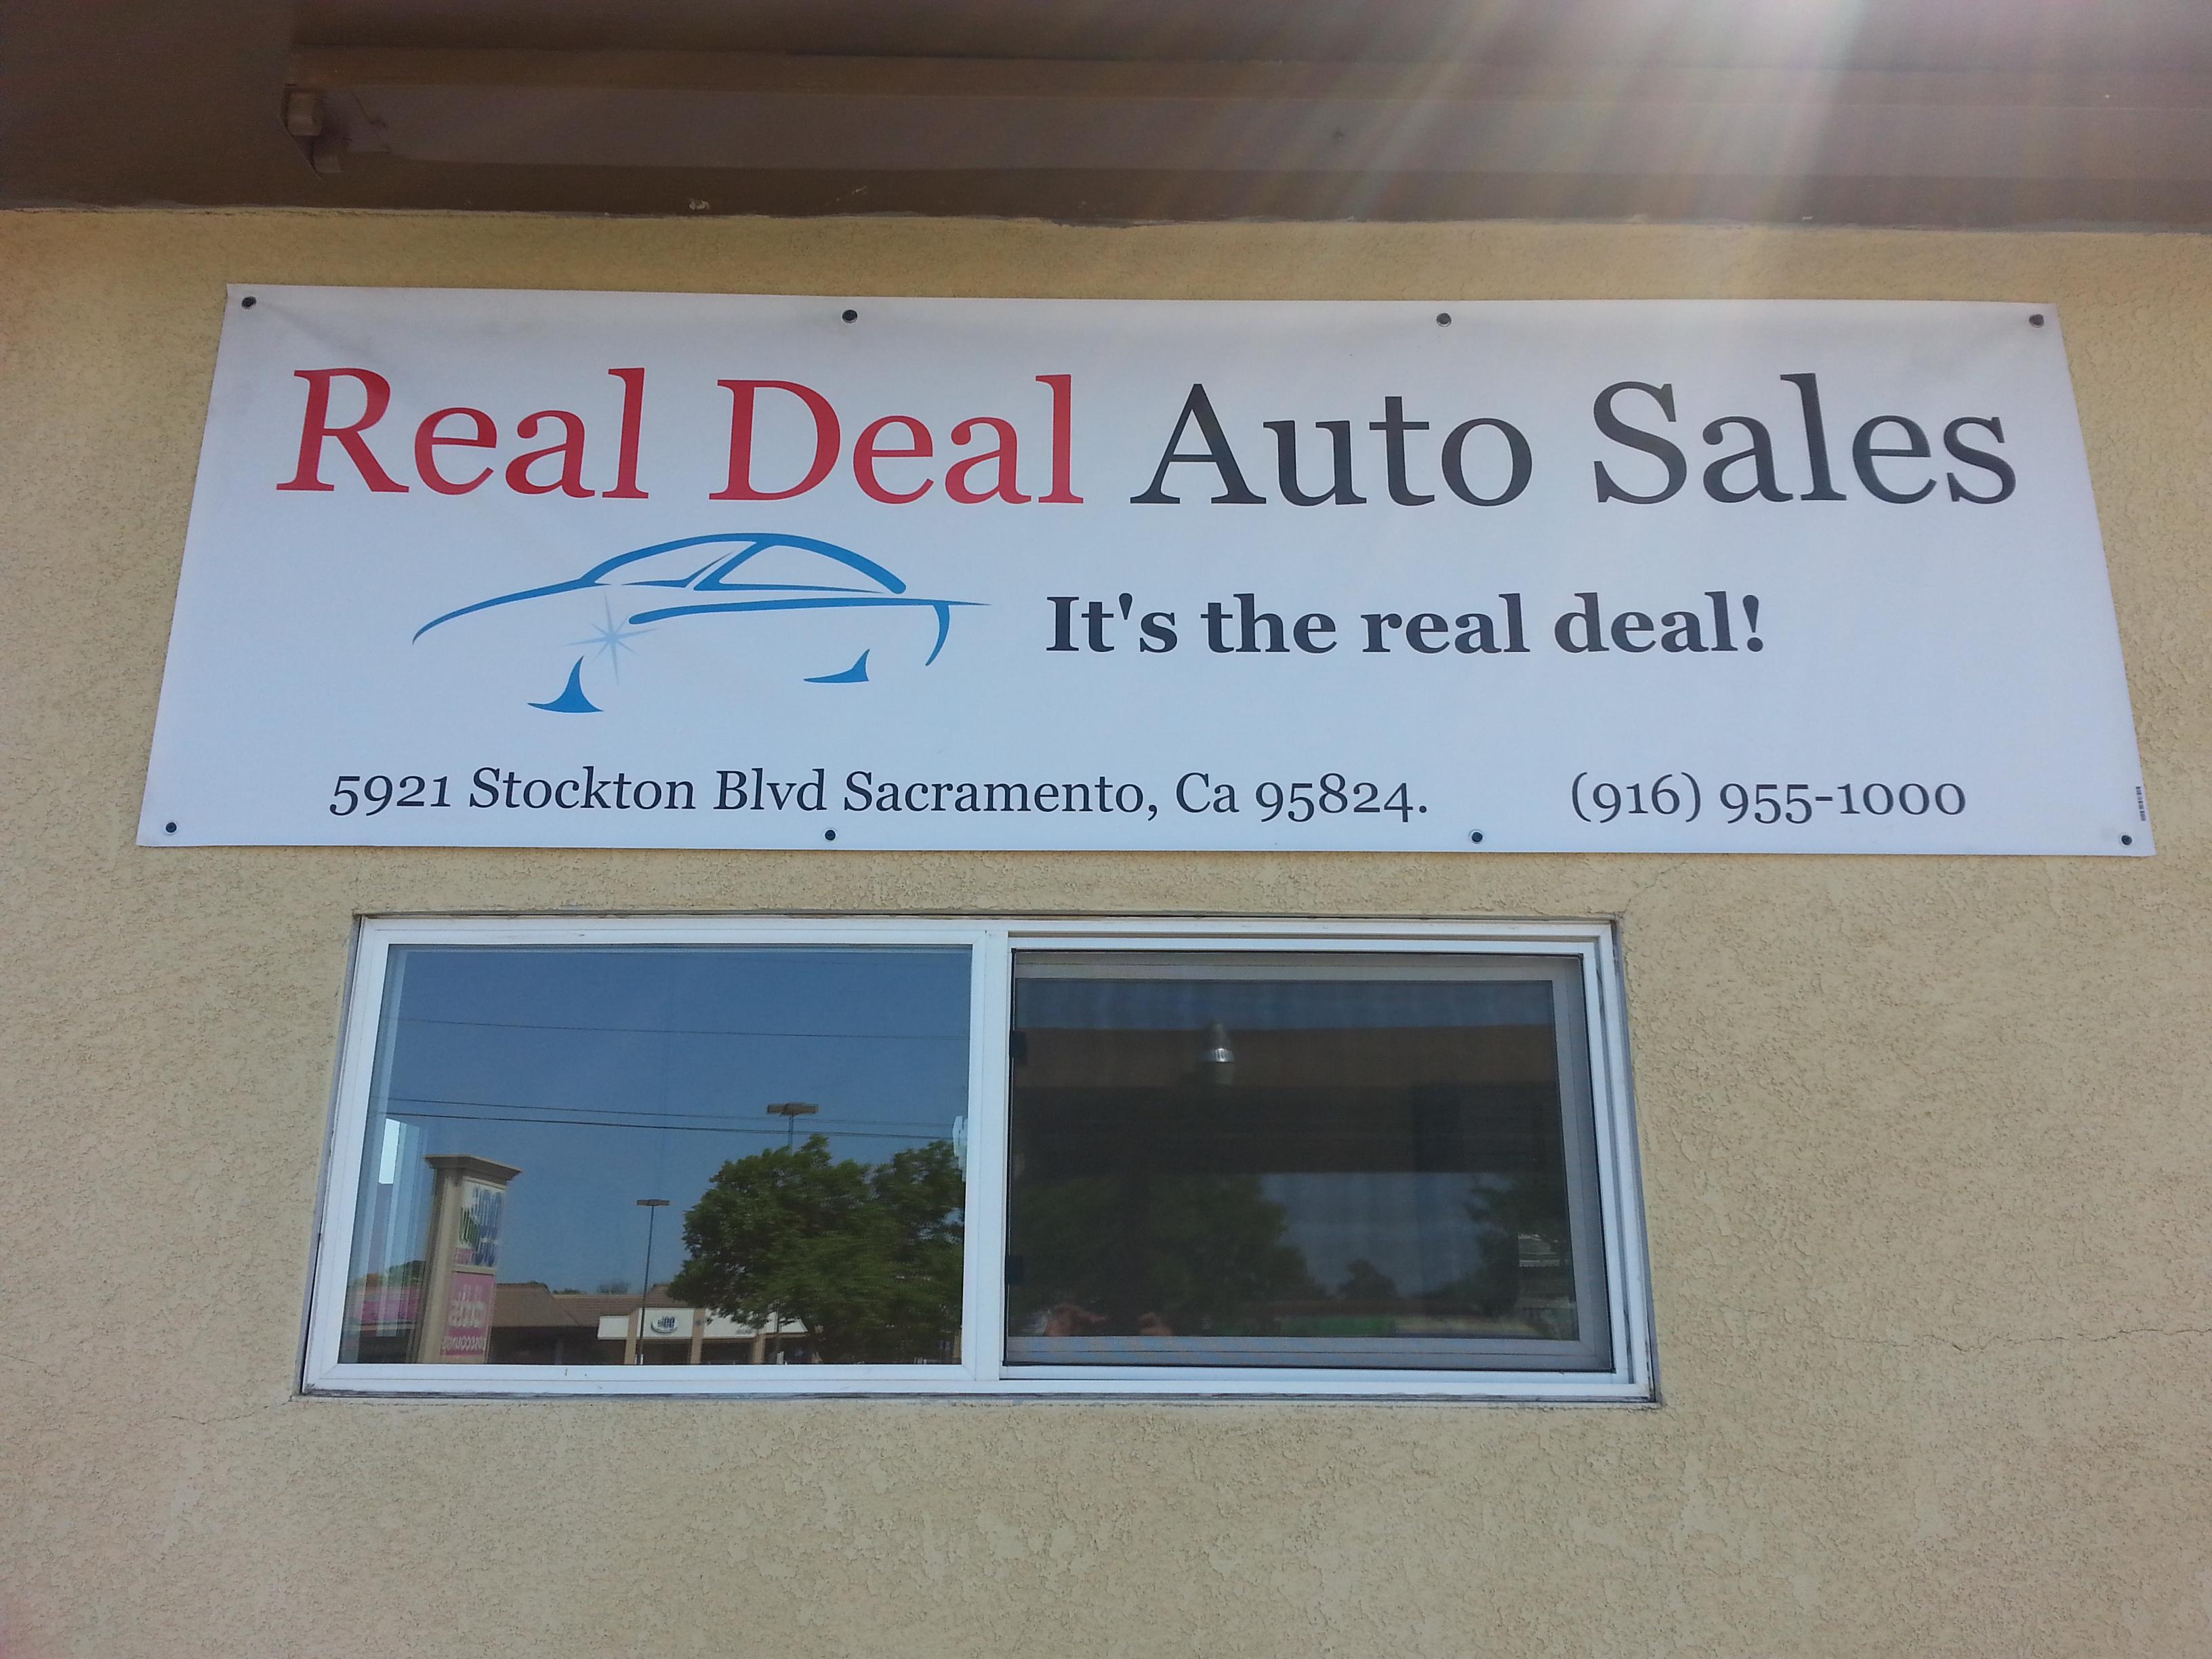 Real Deal Auto Sales 5921 Stockton Blvd Ste A Sacramento CA